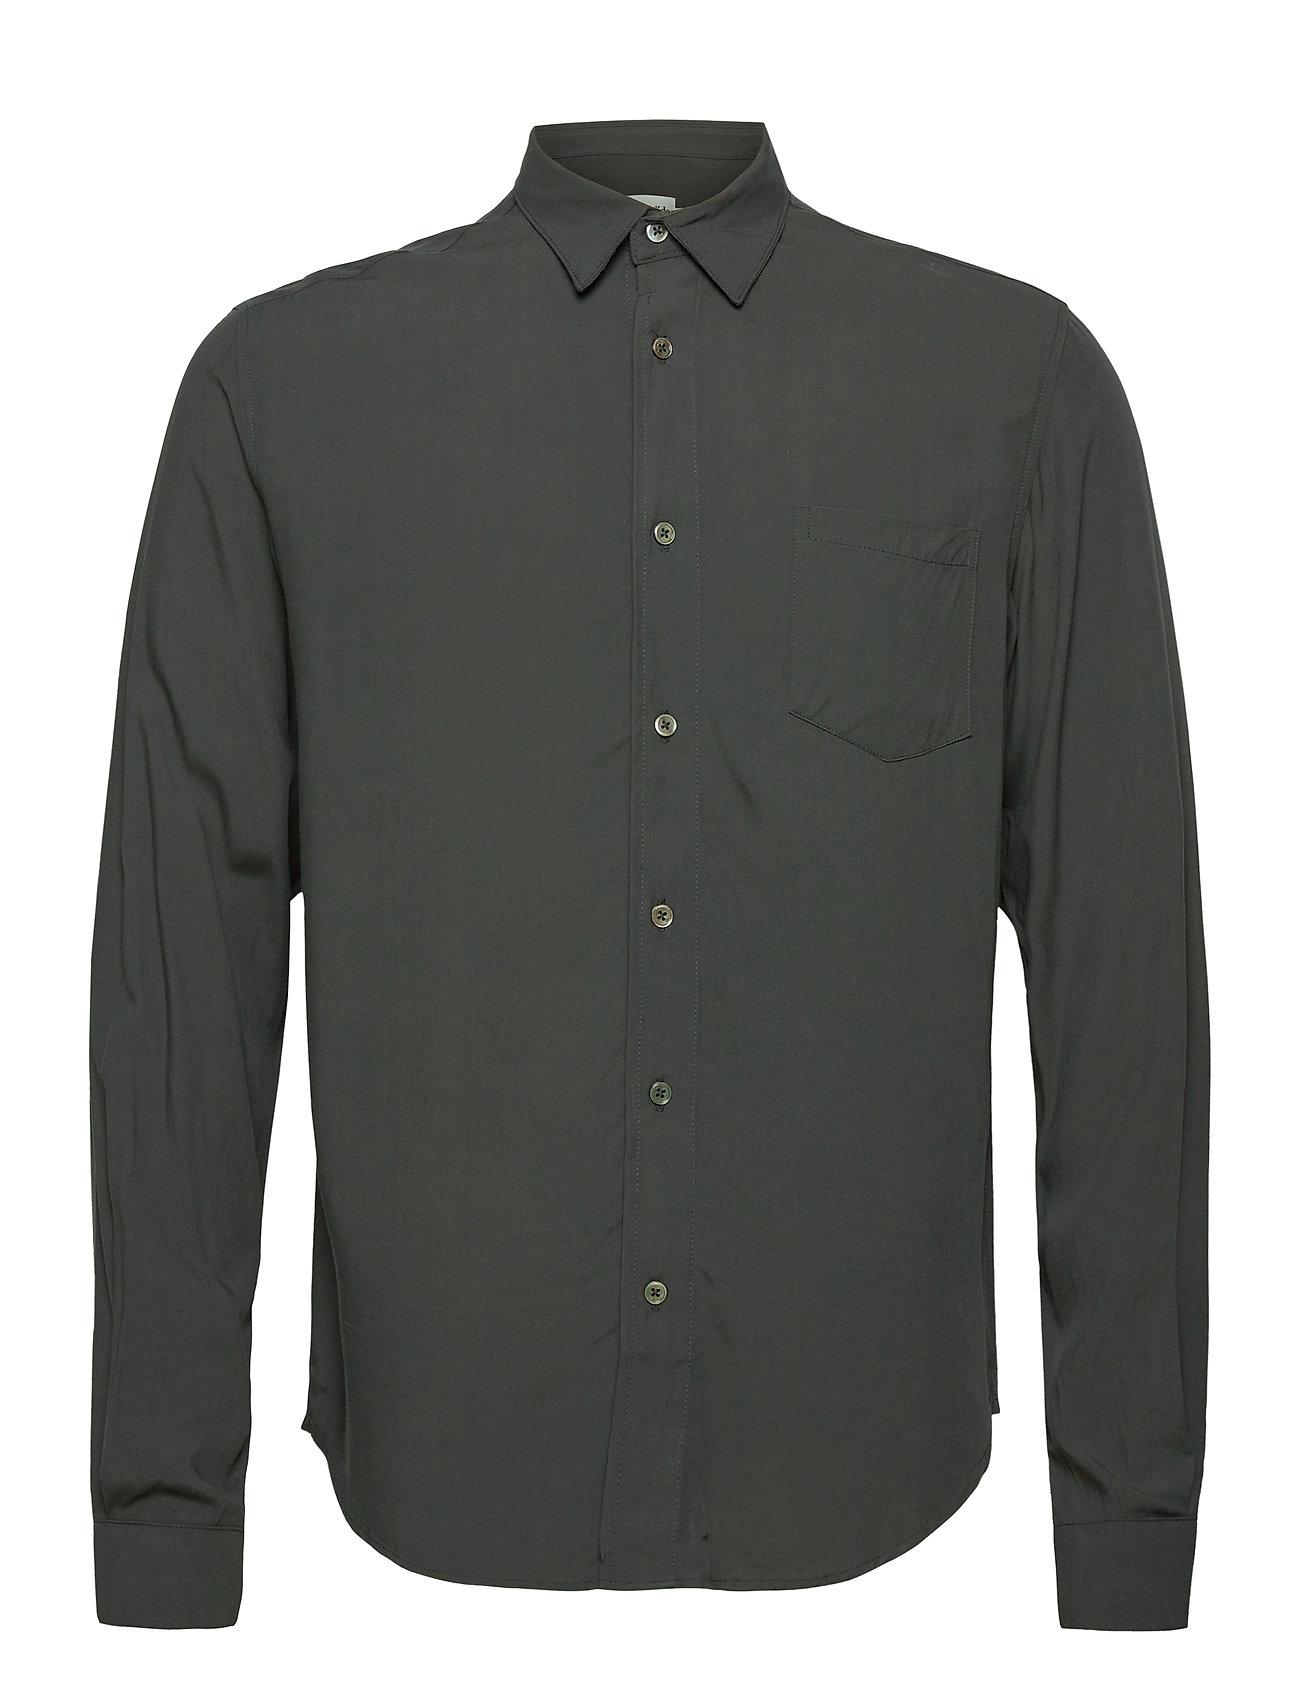 Image of ResteröDs Regular Shirt Skjorte Casual Grøn Resteröds (3445586291)